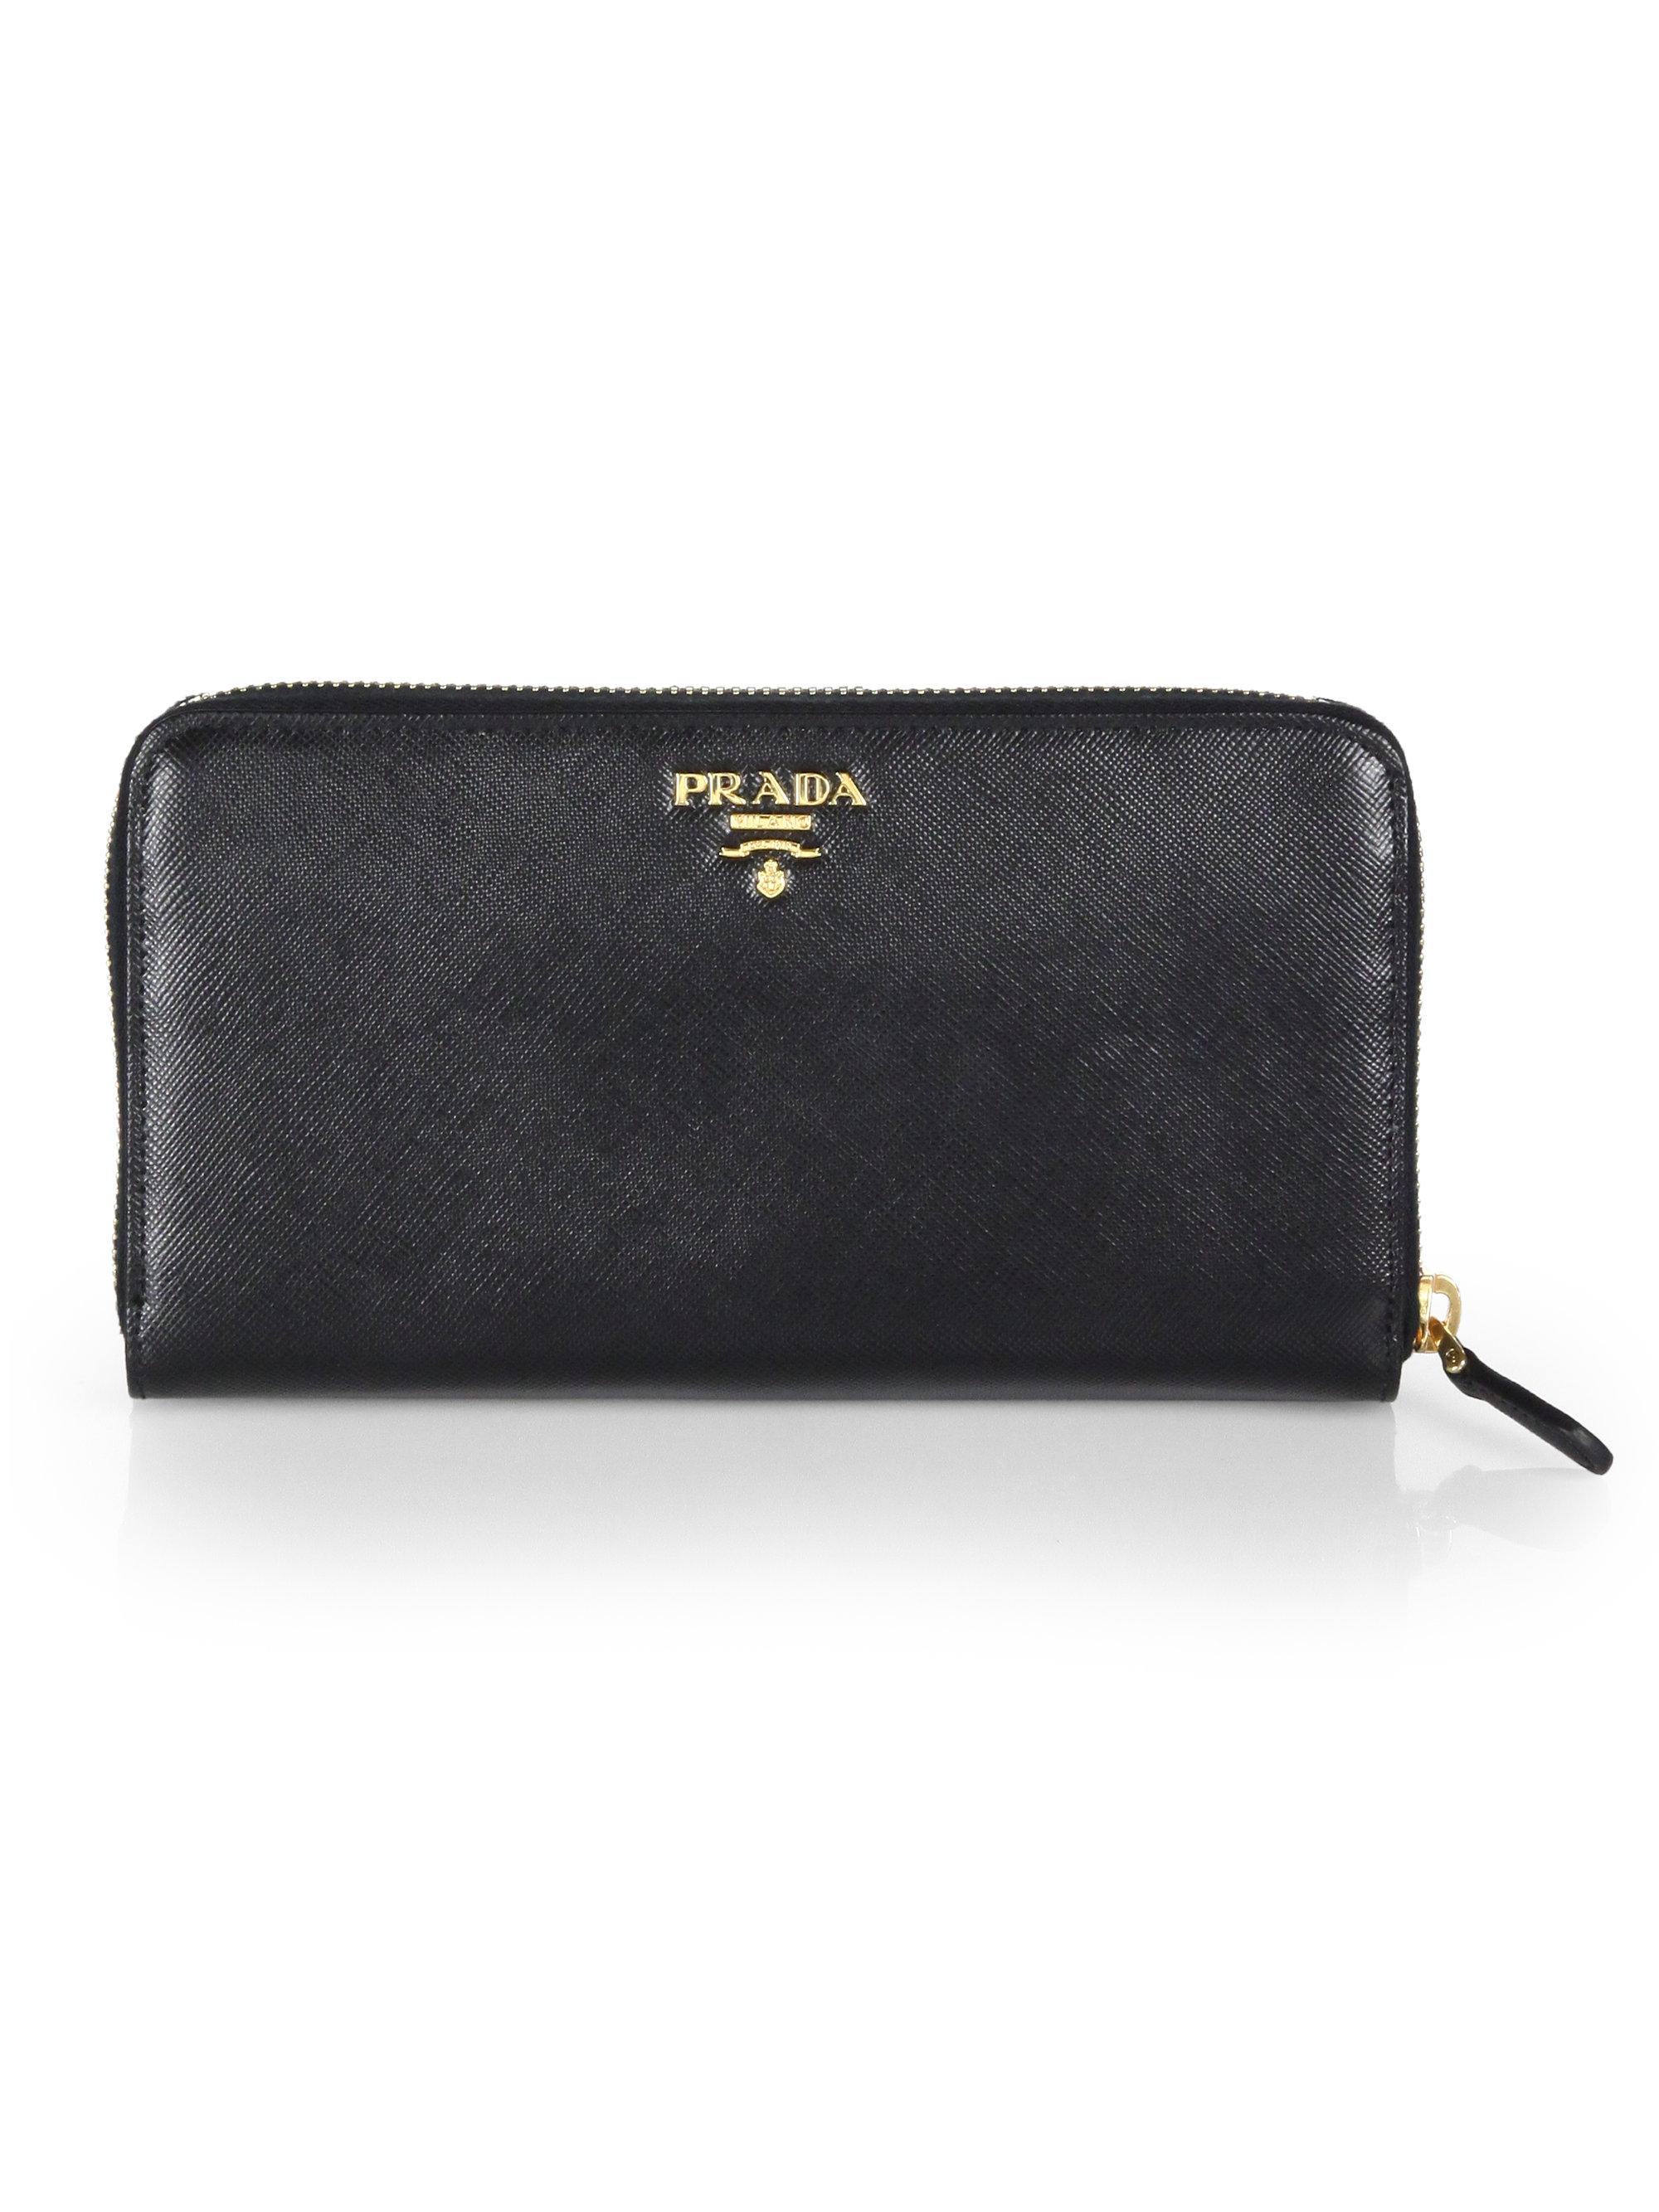 prada nylon tote bag - Prada Saffiano Continental Zip Wallet in Black | Lyst